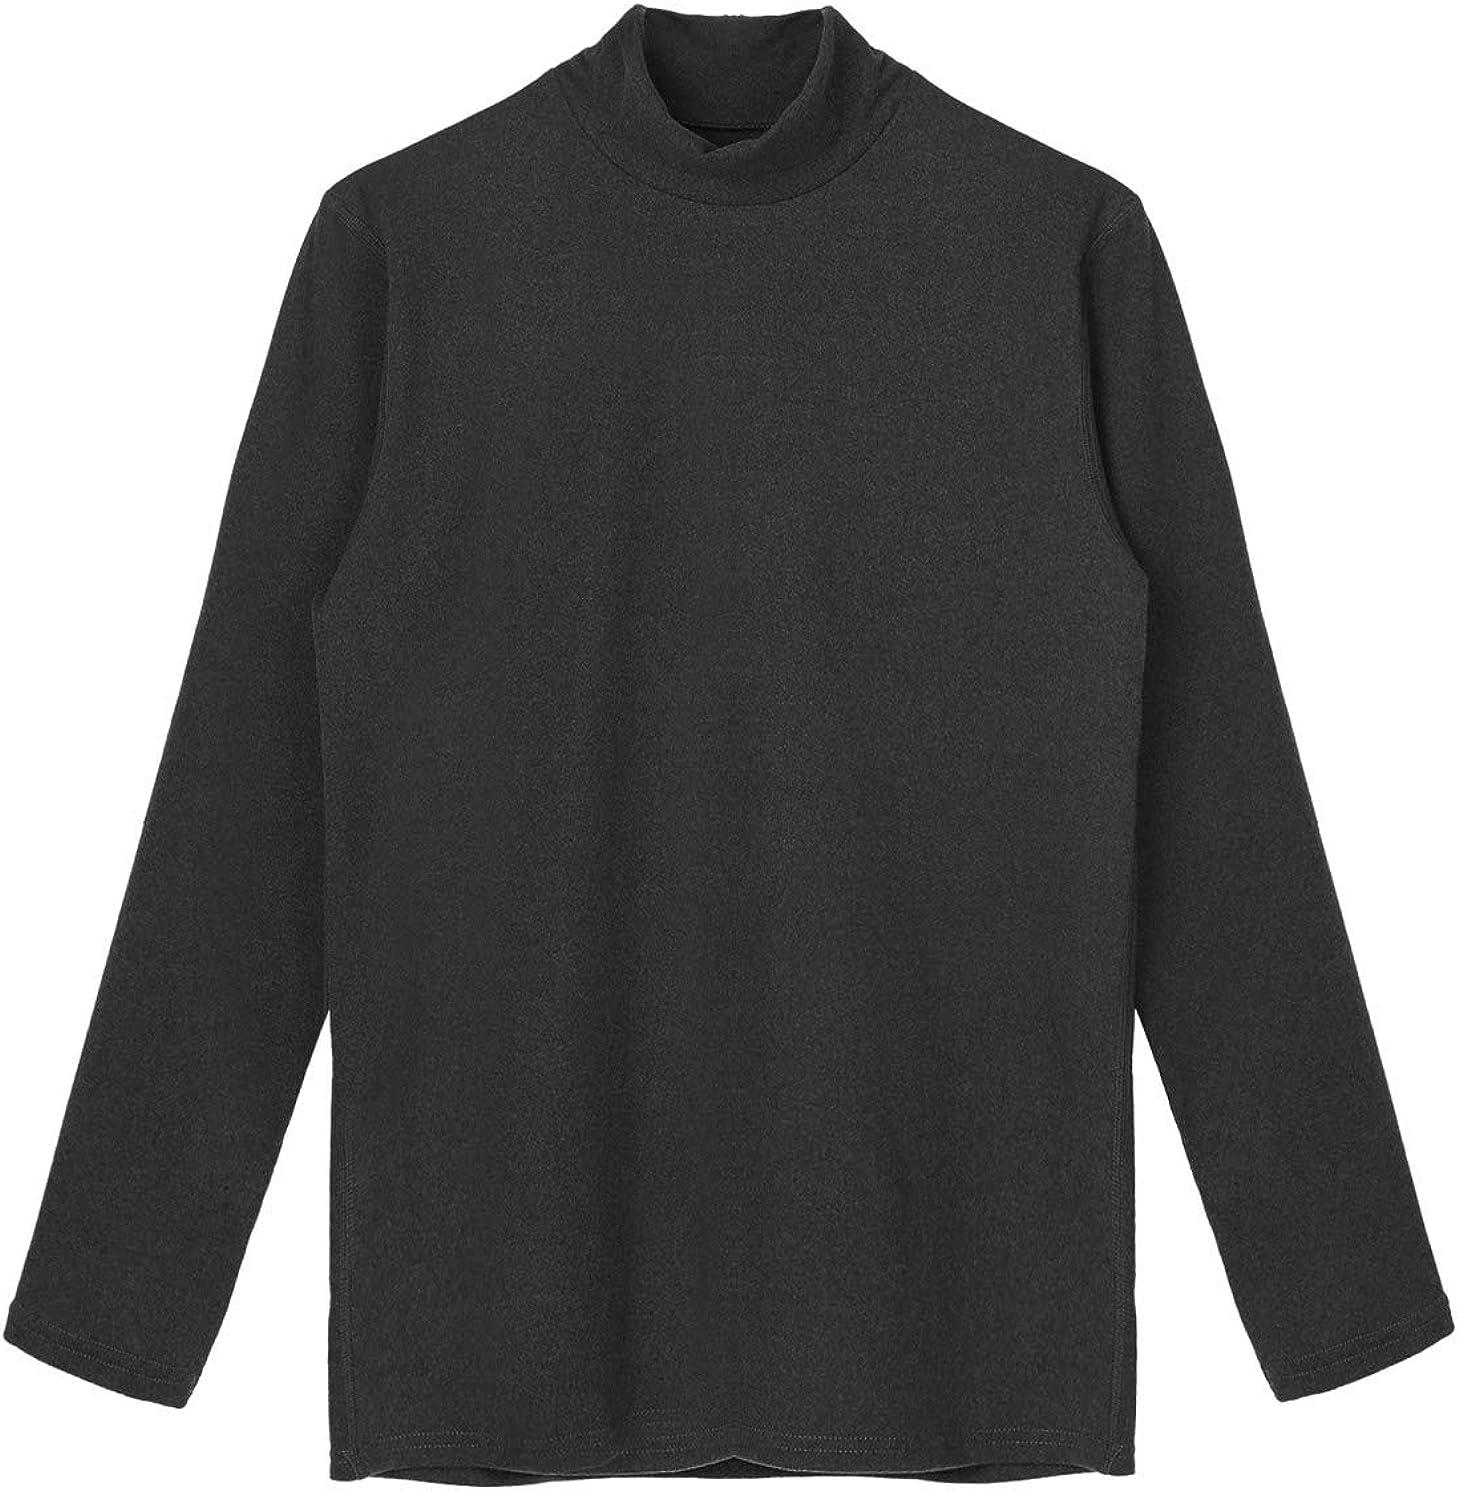 YOOJOO Men's Turtleneck Base Layer Undershirt T-Shirt Casual Long Sleeve Slim Fit Basic Thermal Tops